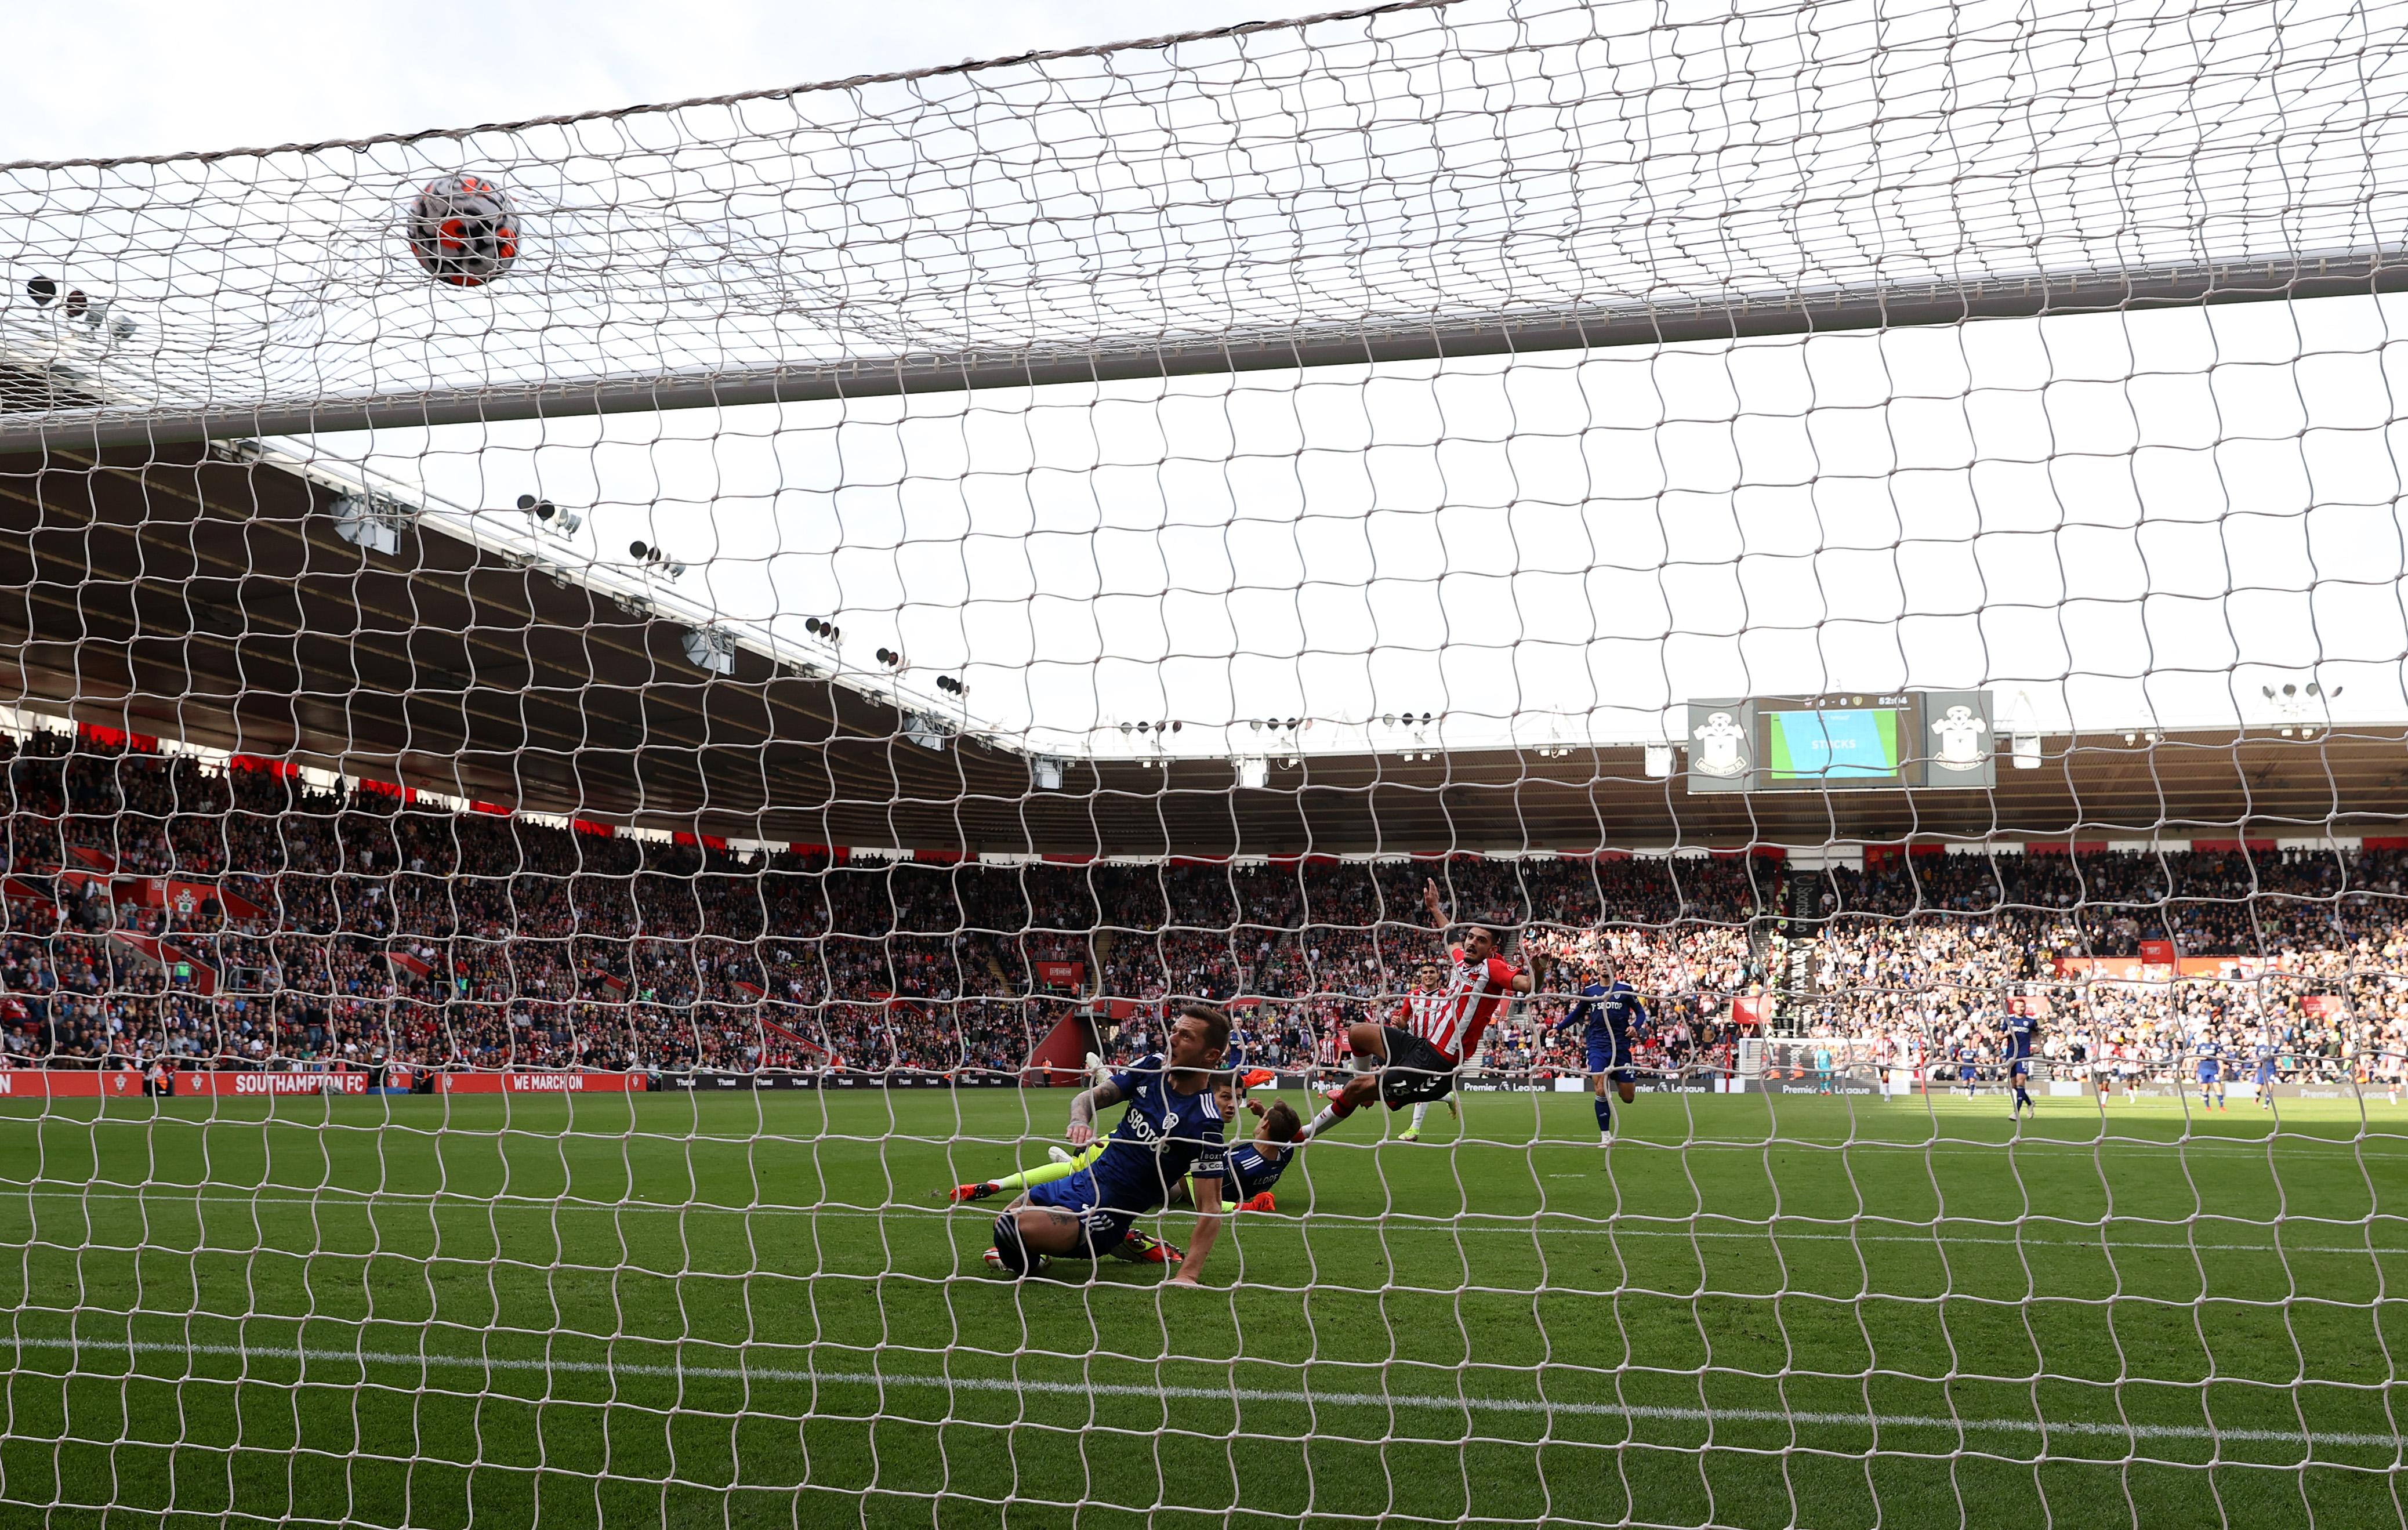 Southampton v Leeds United - Premier League, Armando Broja, match recap, review, Ralph Hasenhuttl, Marcelo Bielsa